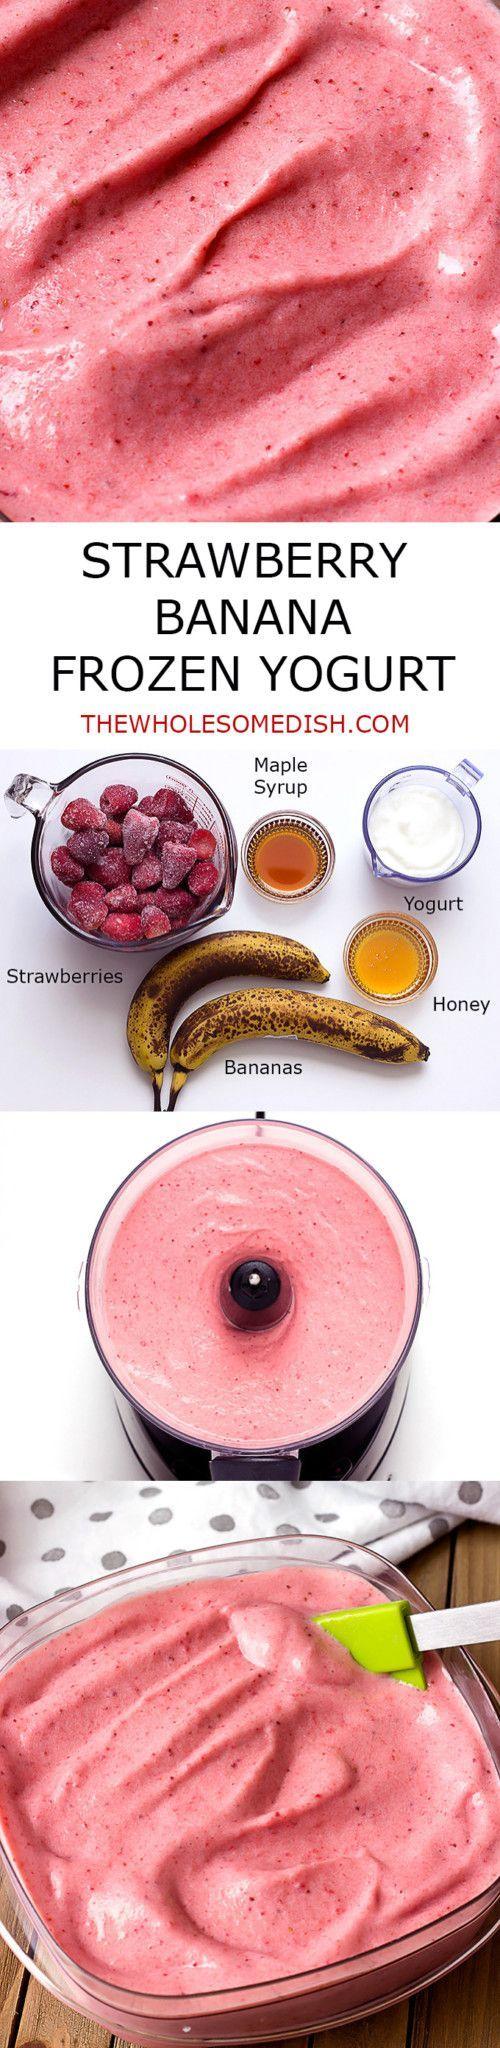 Strawberry Banana Frozen Yogurt - homemade with simple ingredients: strawberries, bananas, yogurt, maple syrup, and honey. via /afinks/